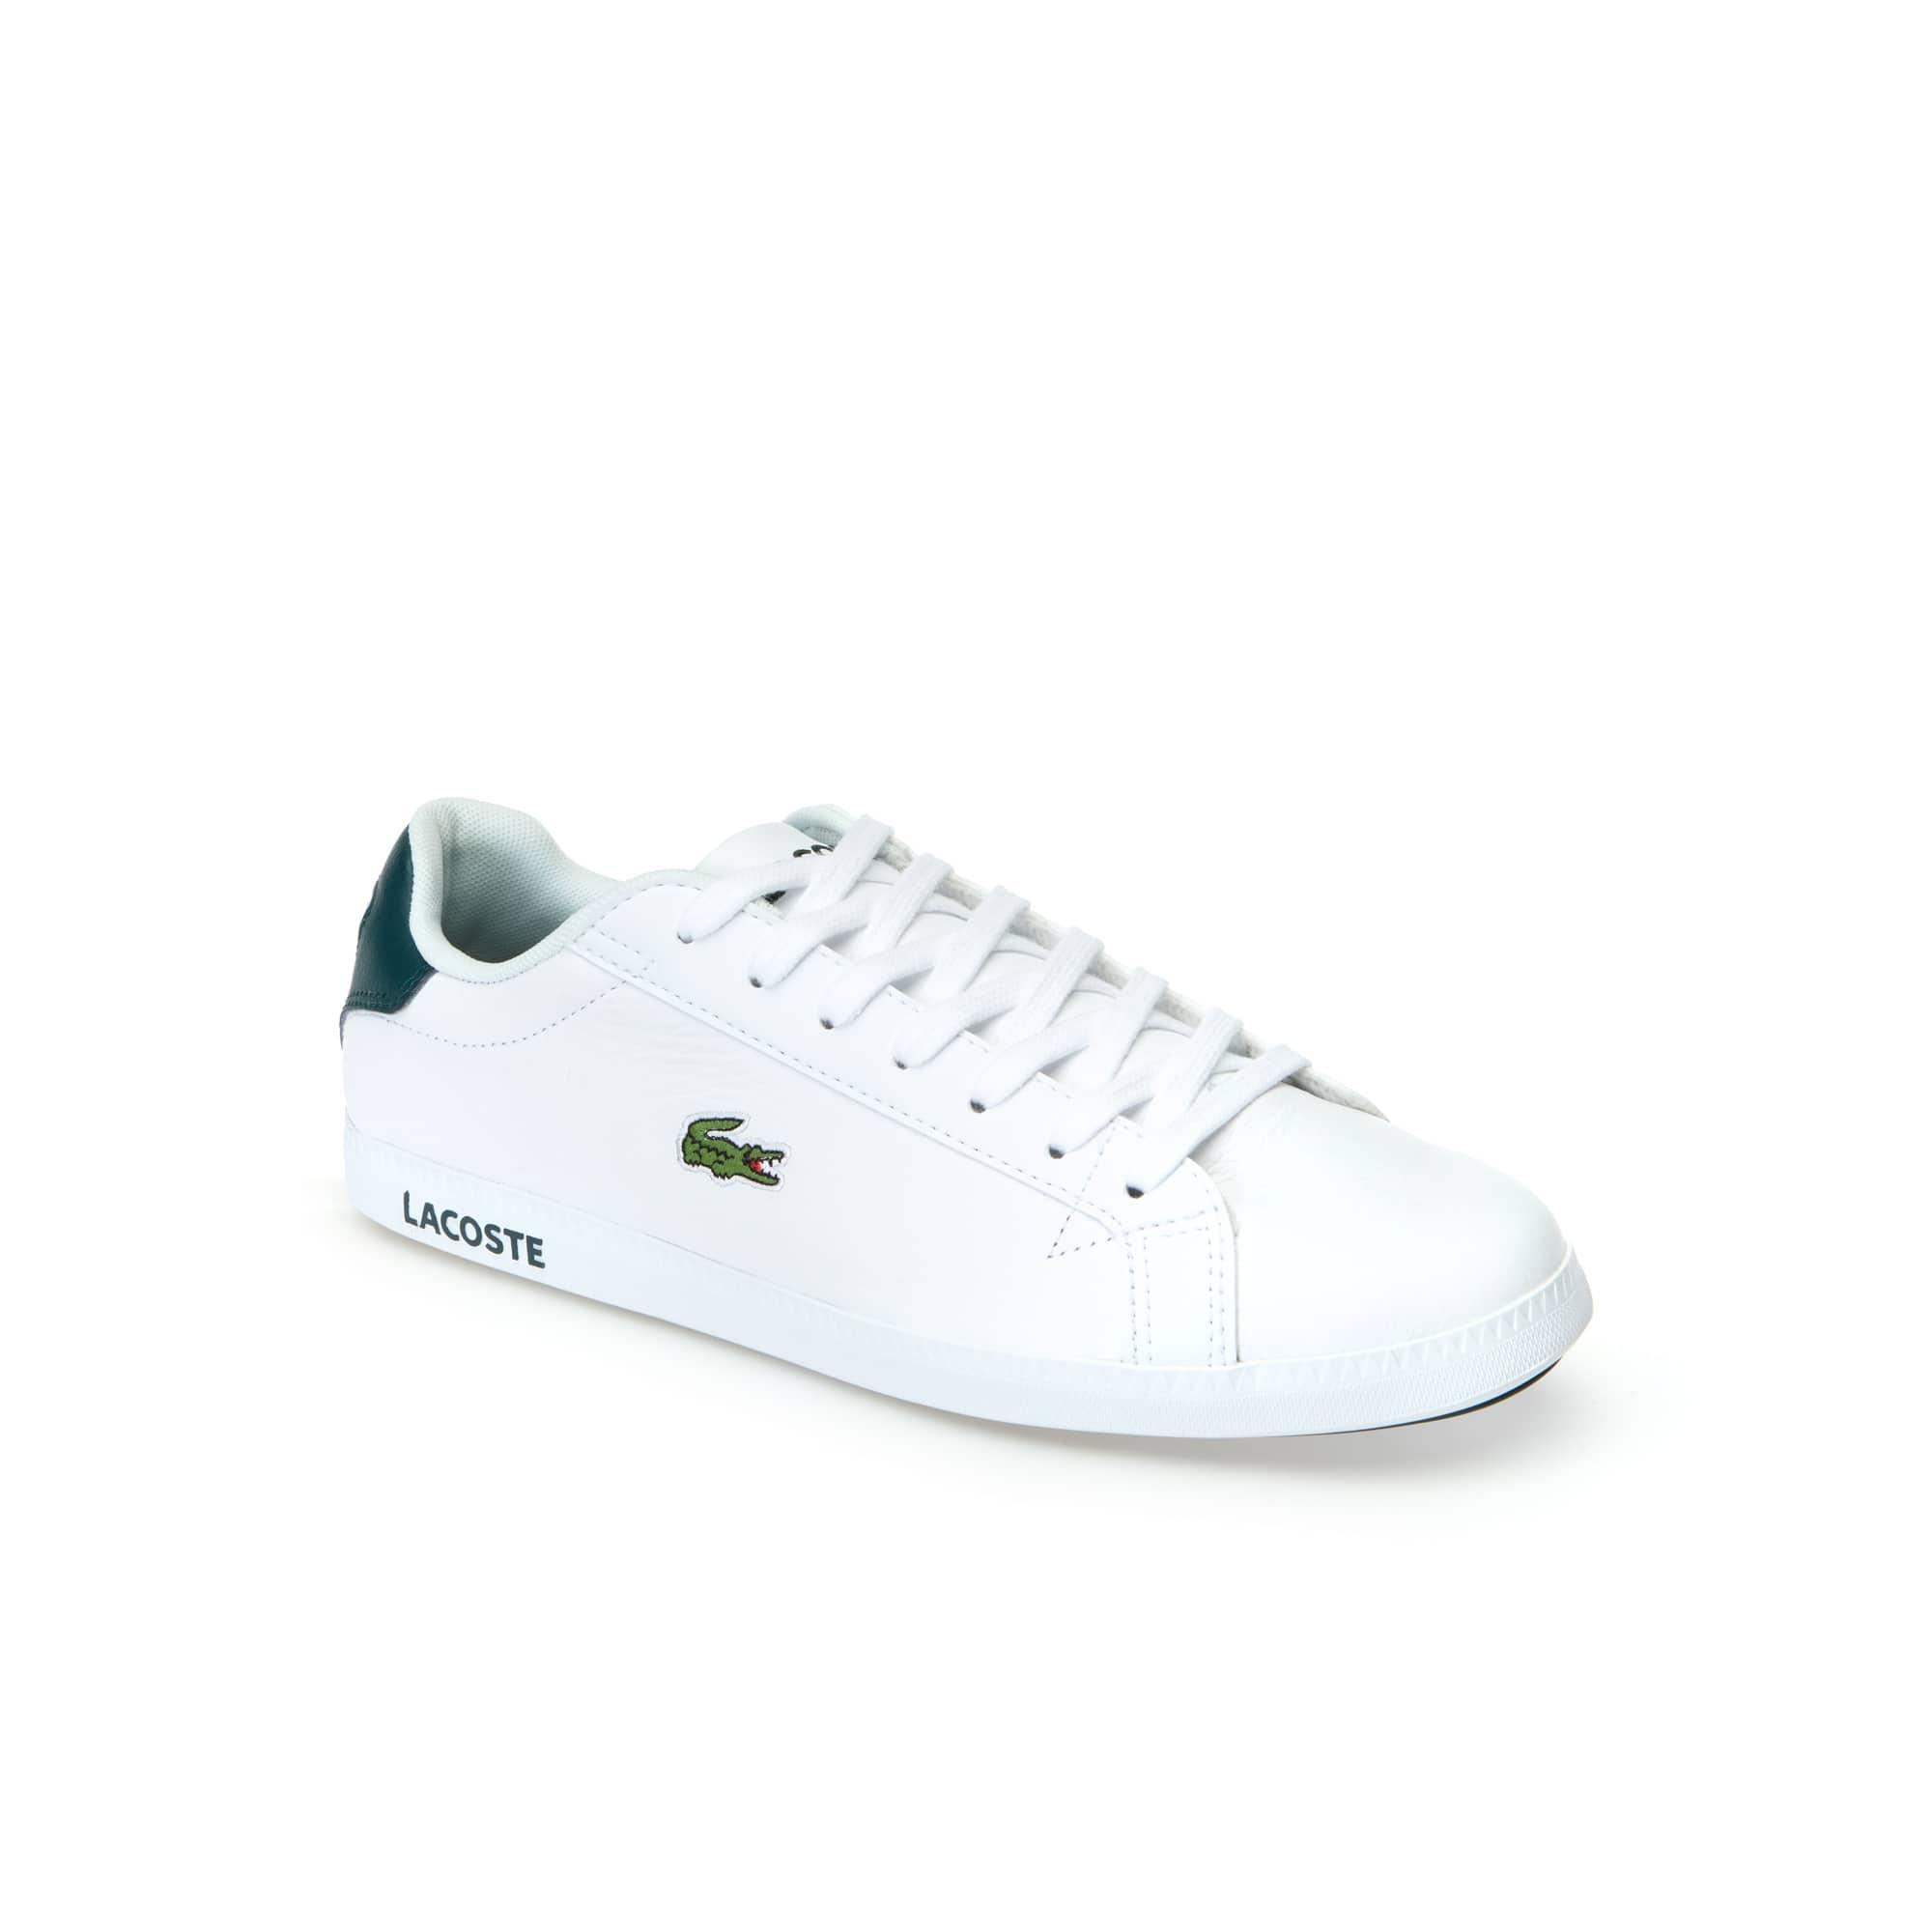 Herren-Sneakers GRADUATE LCR3 aus Leder